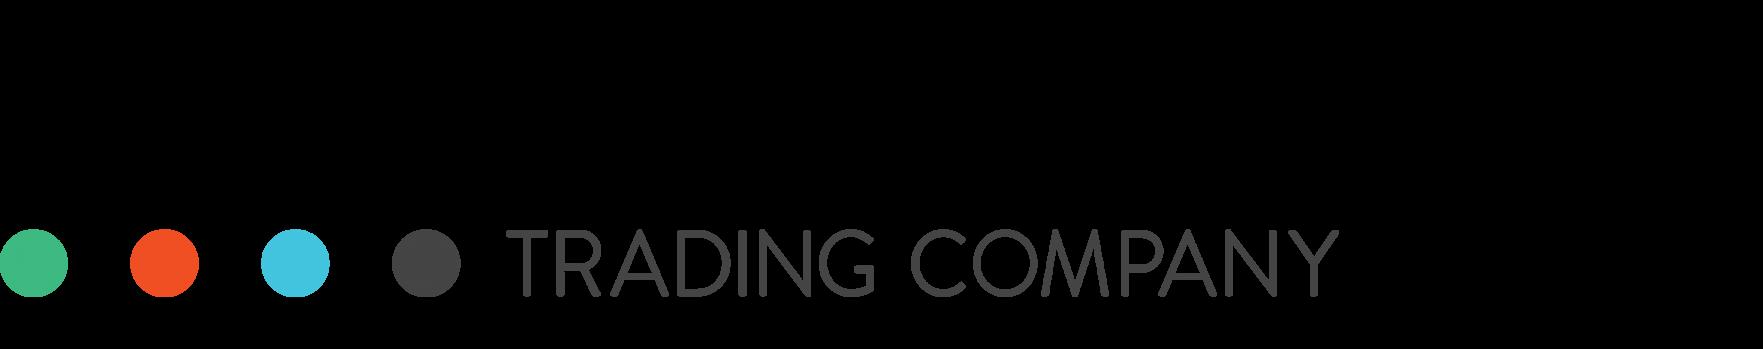 Four Seasons Trading Company